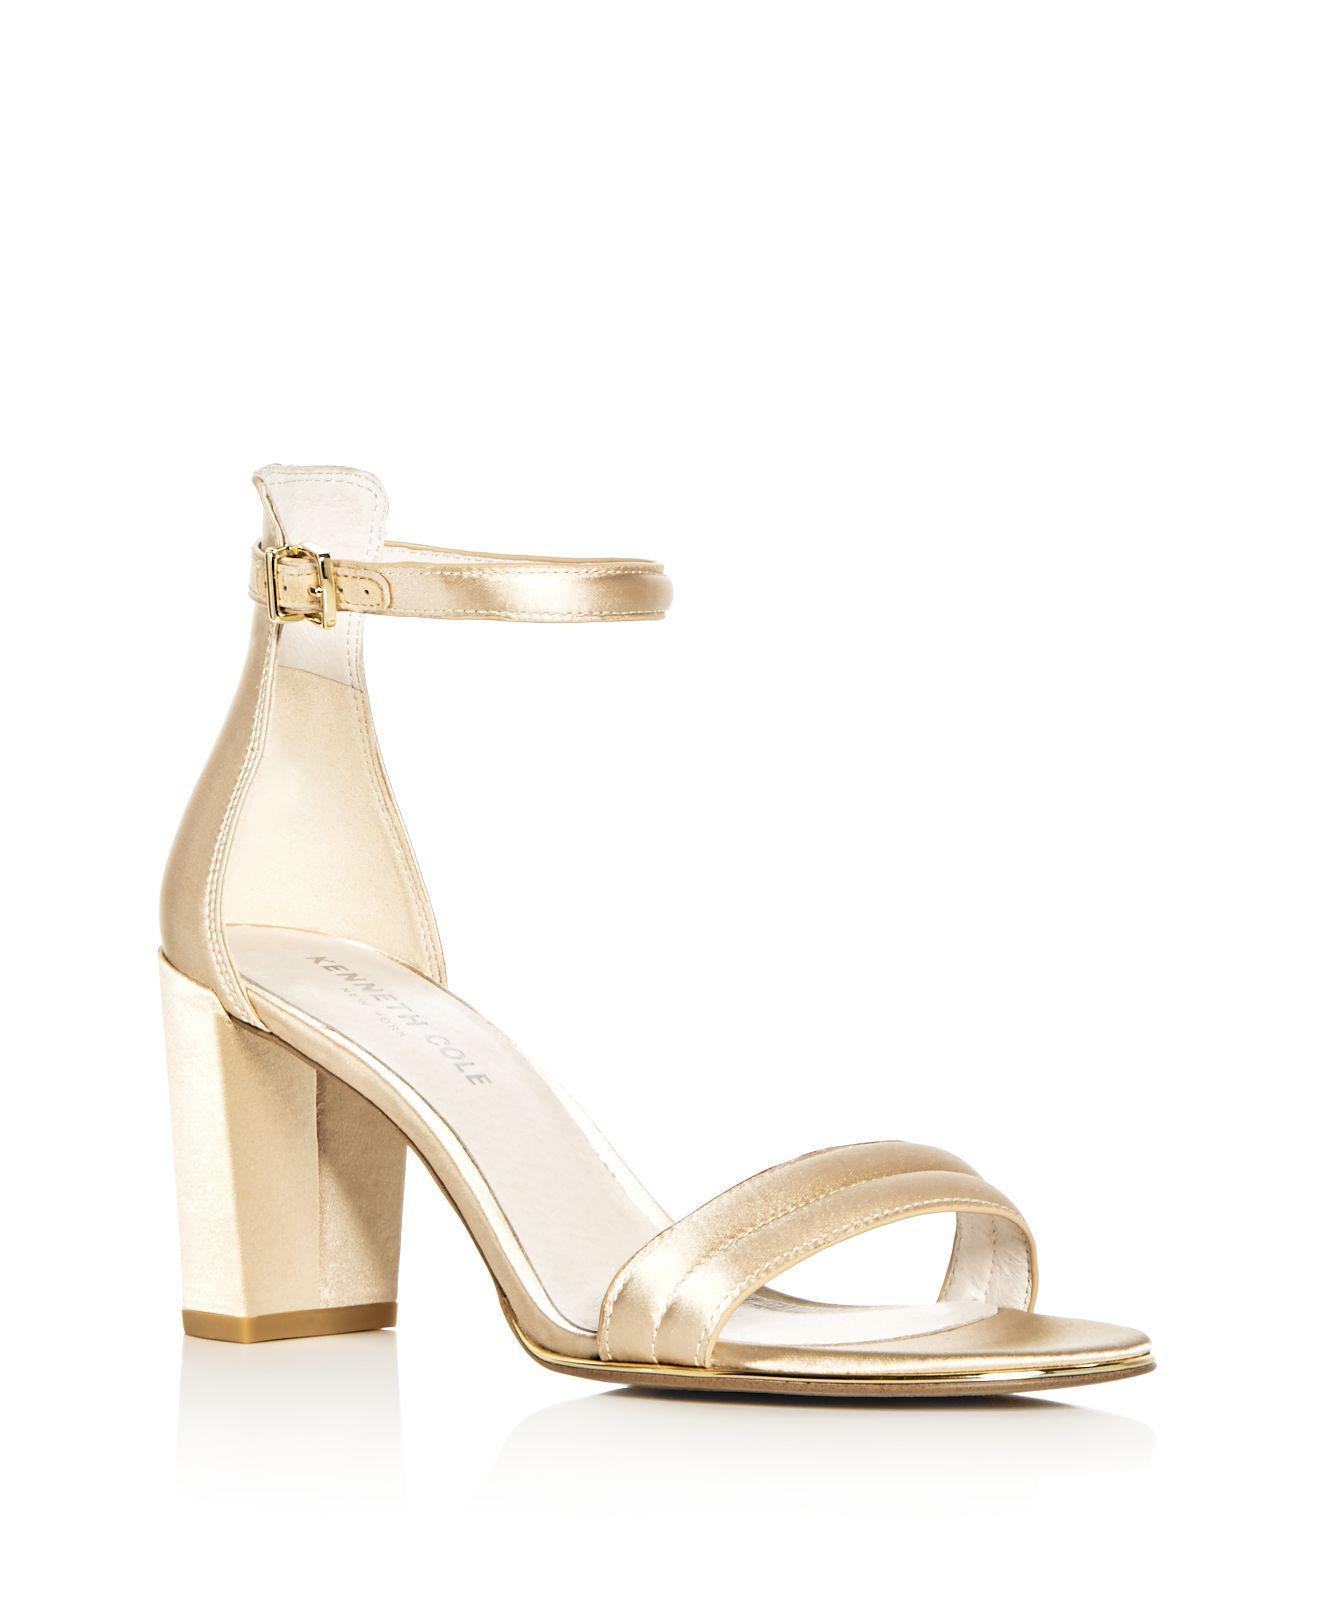 Kenneth Cole Women's Lex Satin High Block Heel Sandals 8pvmQz4